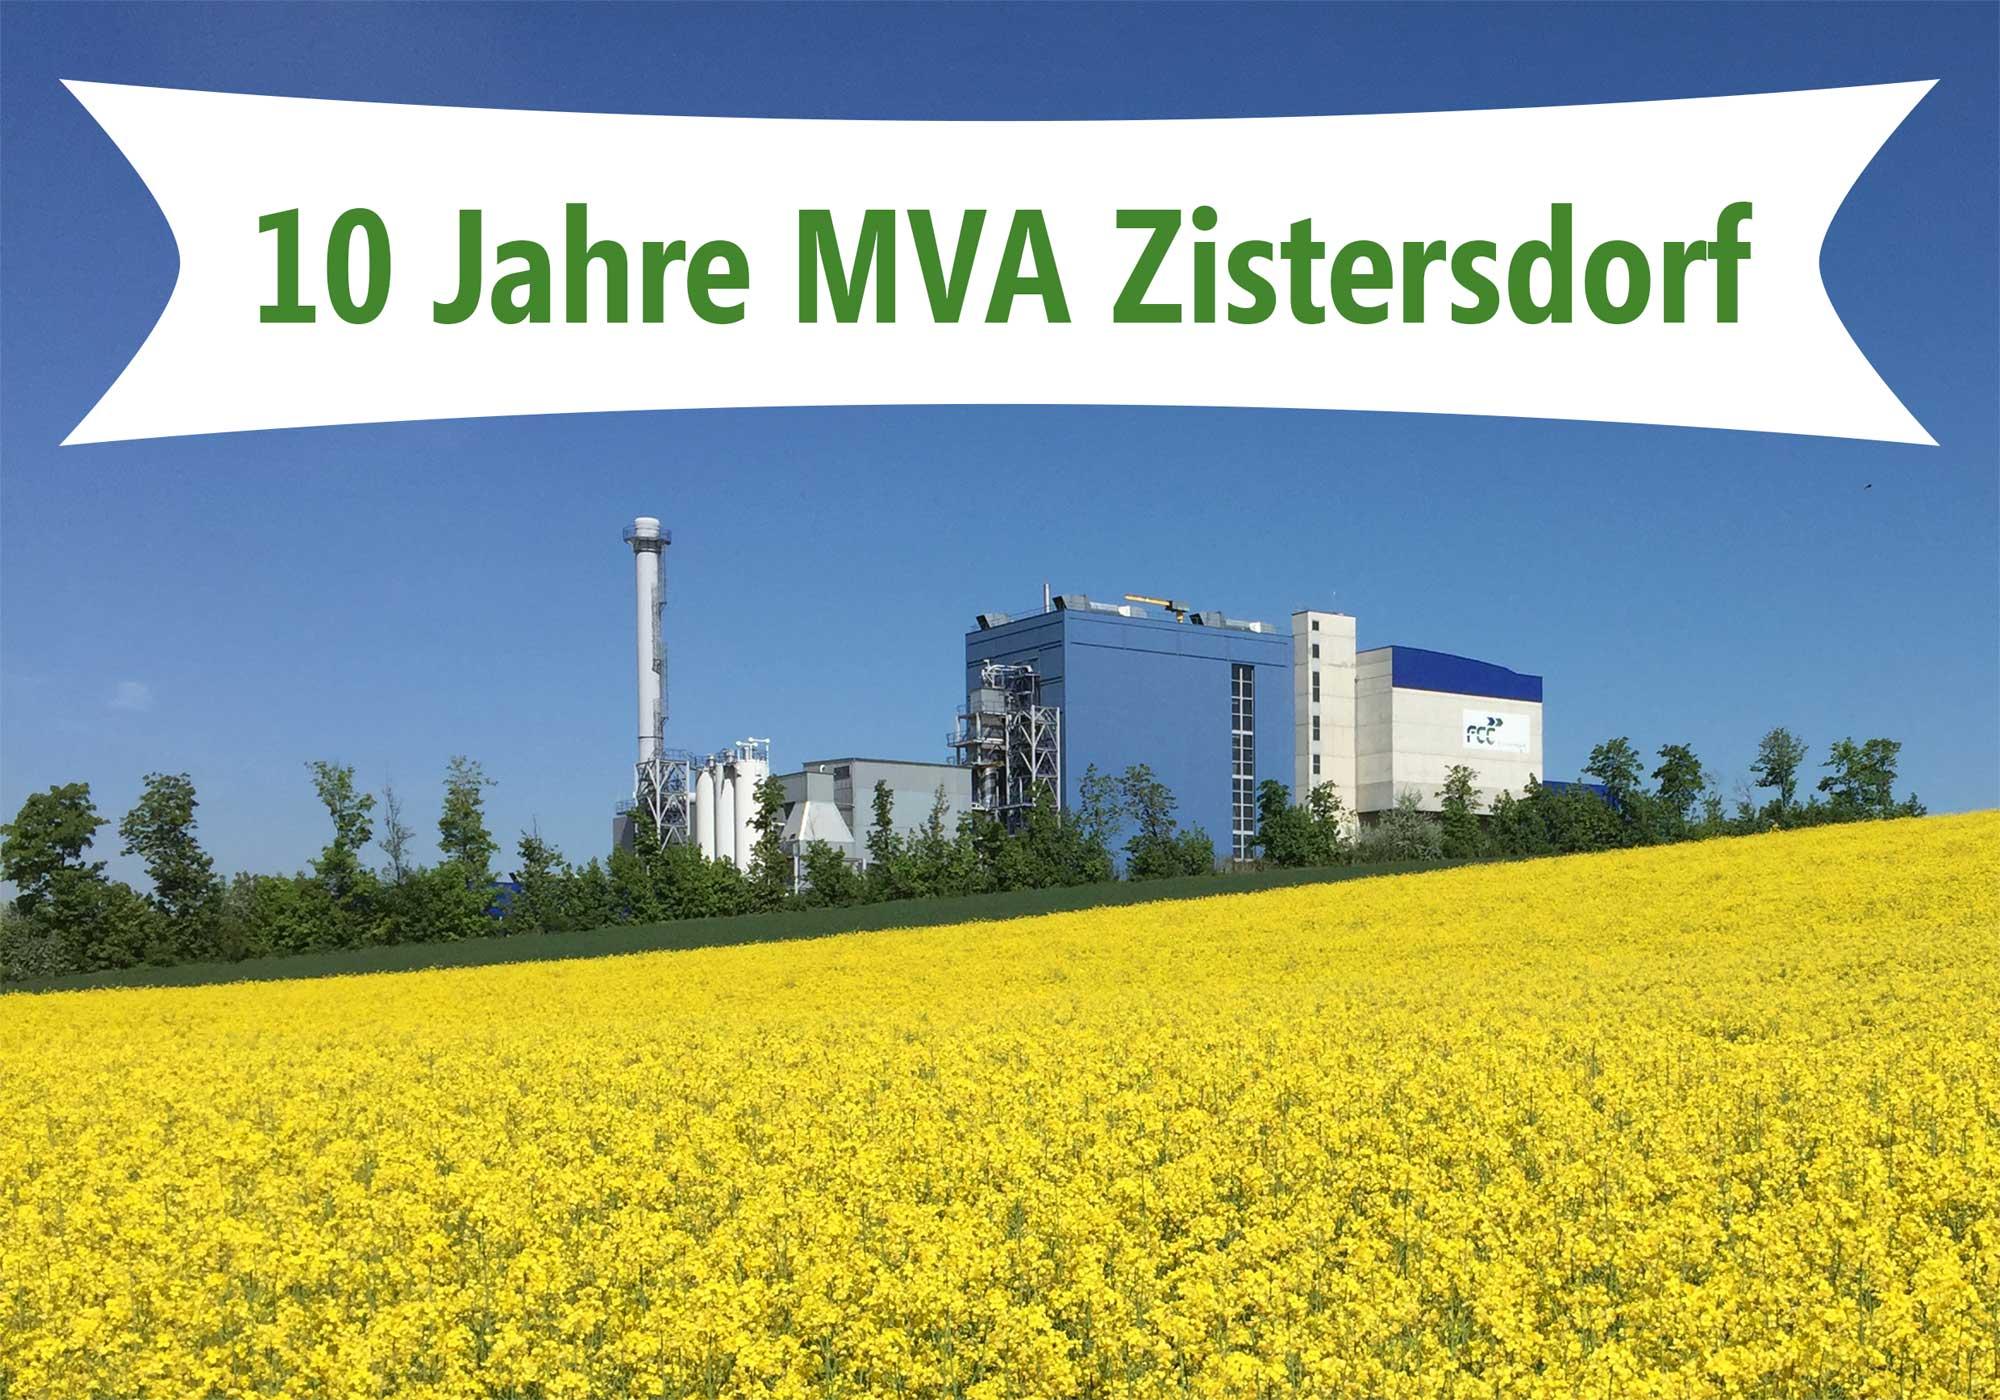 10-jahre-fcc-zistersdorf-abfall-service-online